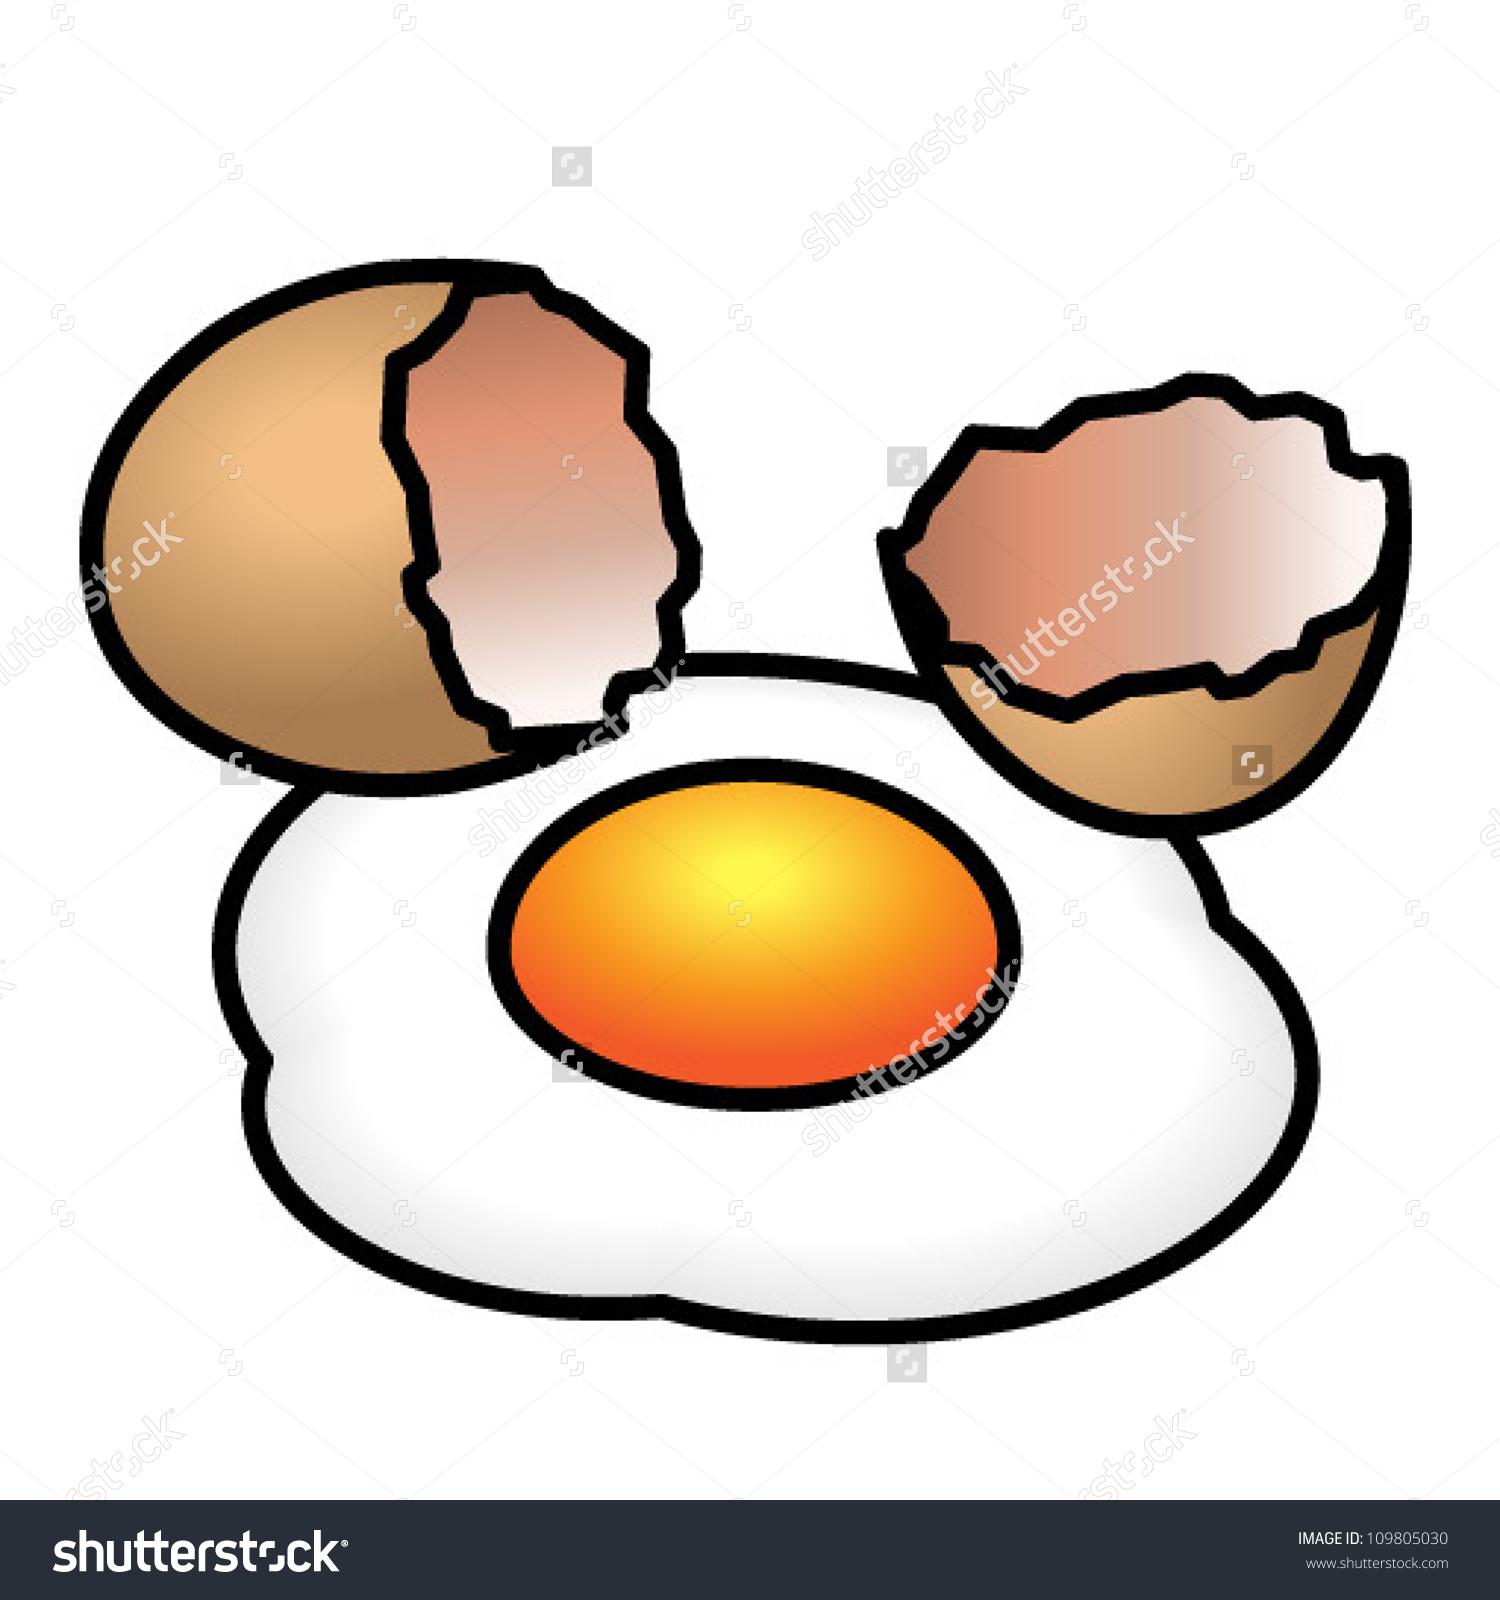 1500x1600 Cracked Open Egg Clipart